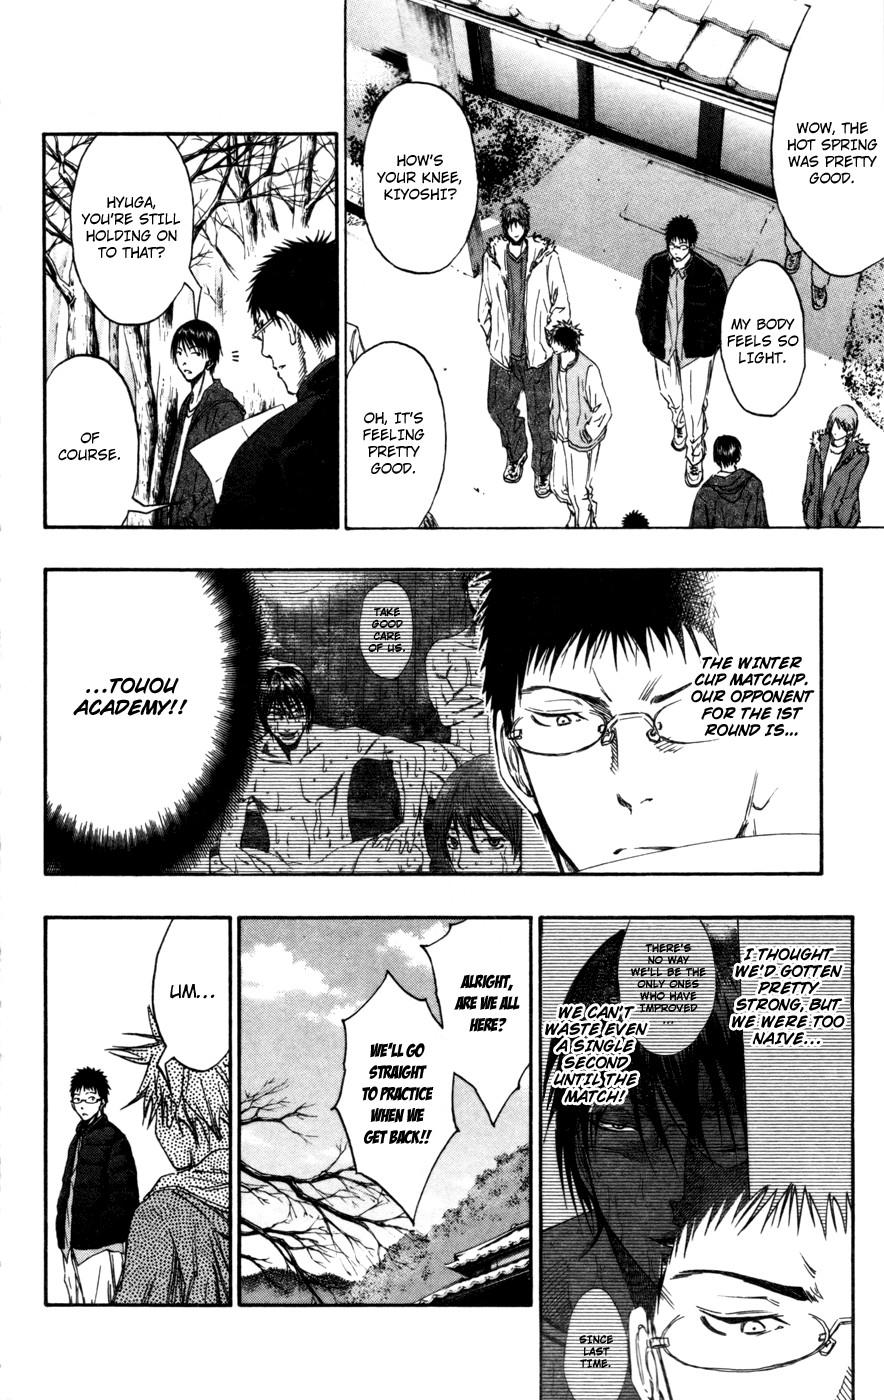 Kuroko no Basket Manga Chapter 111 - Image 04